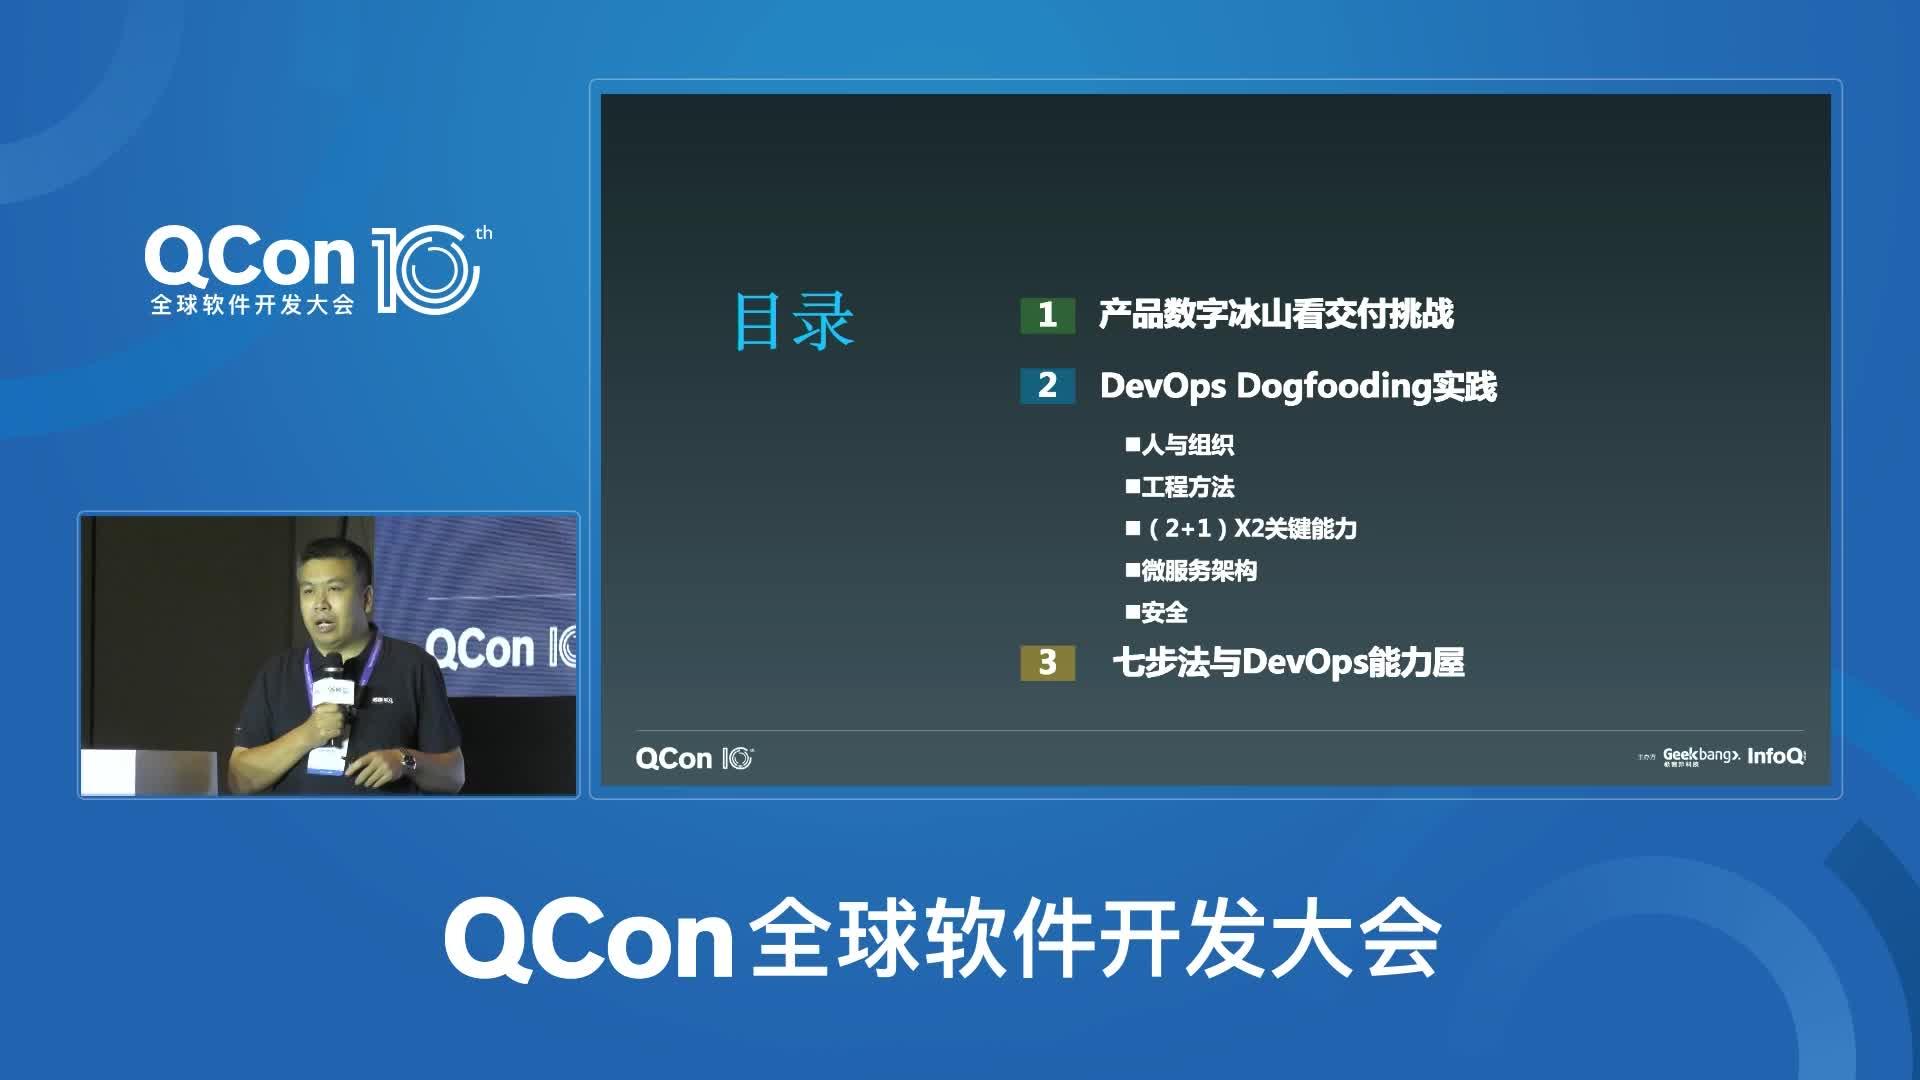 DevOps 转型之工程效率提升丨QCon